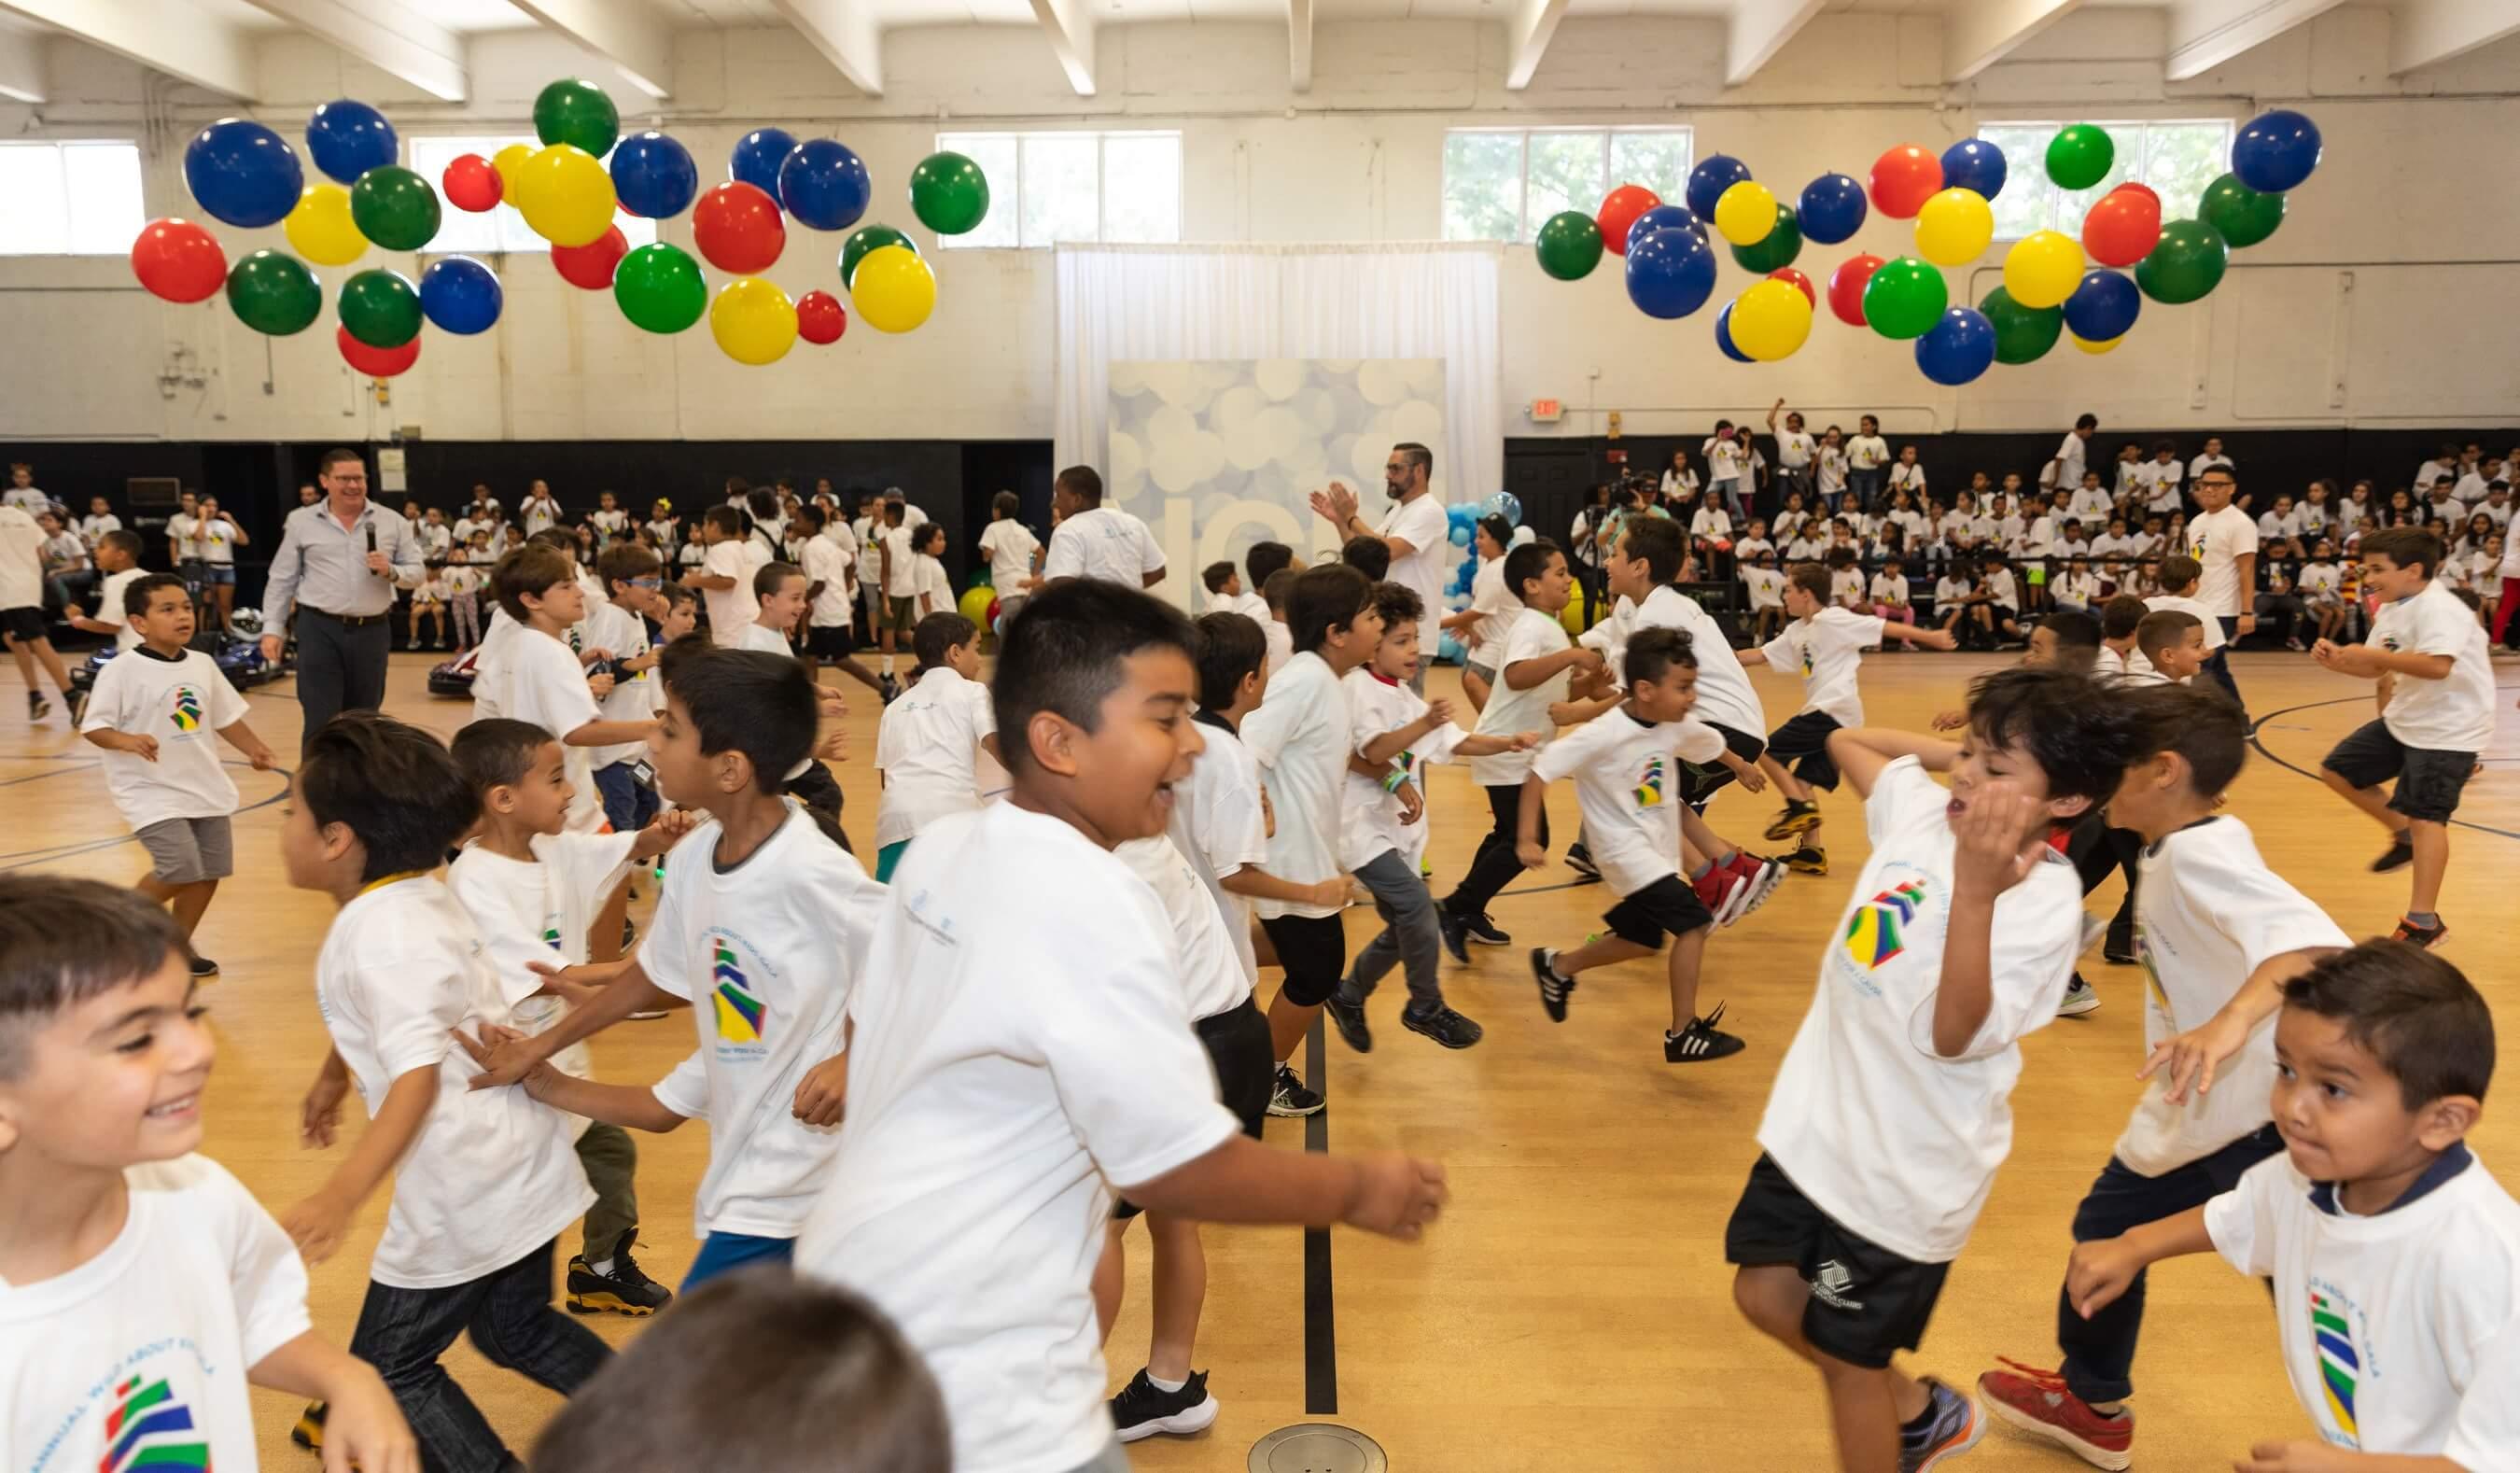 Norwegian Cruise Line donates new ship to Boys & Girls Clubs ff Miami-Dade